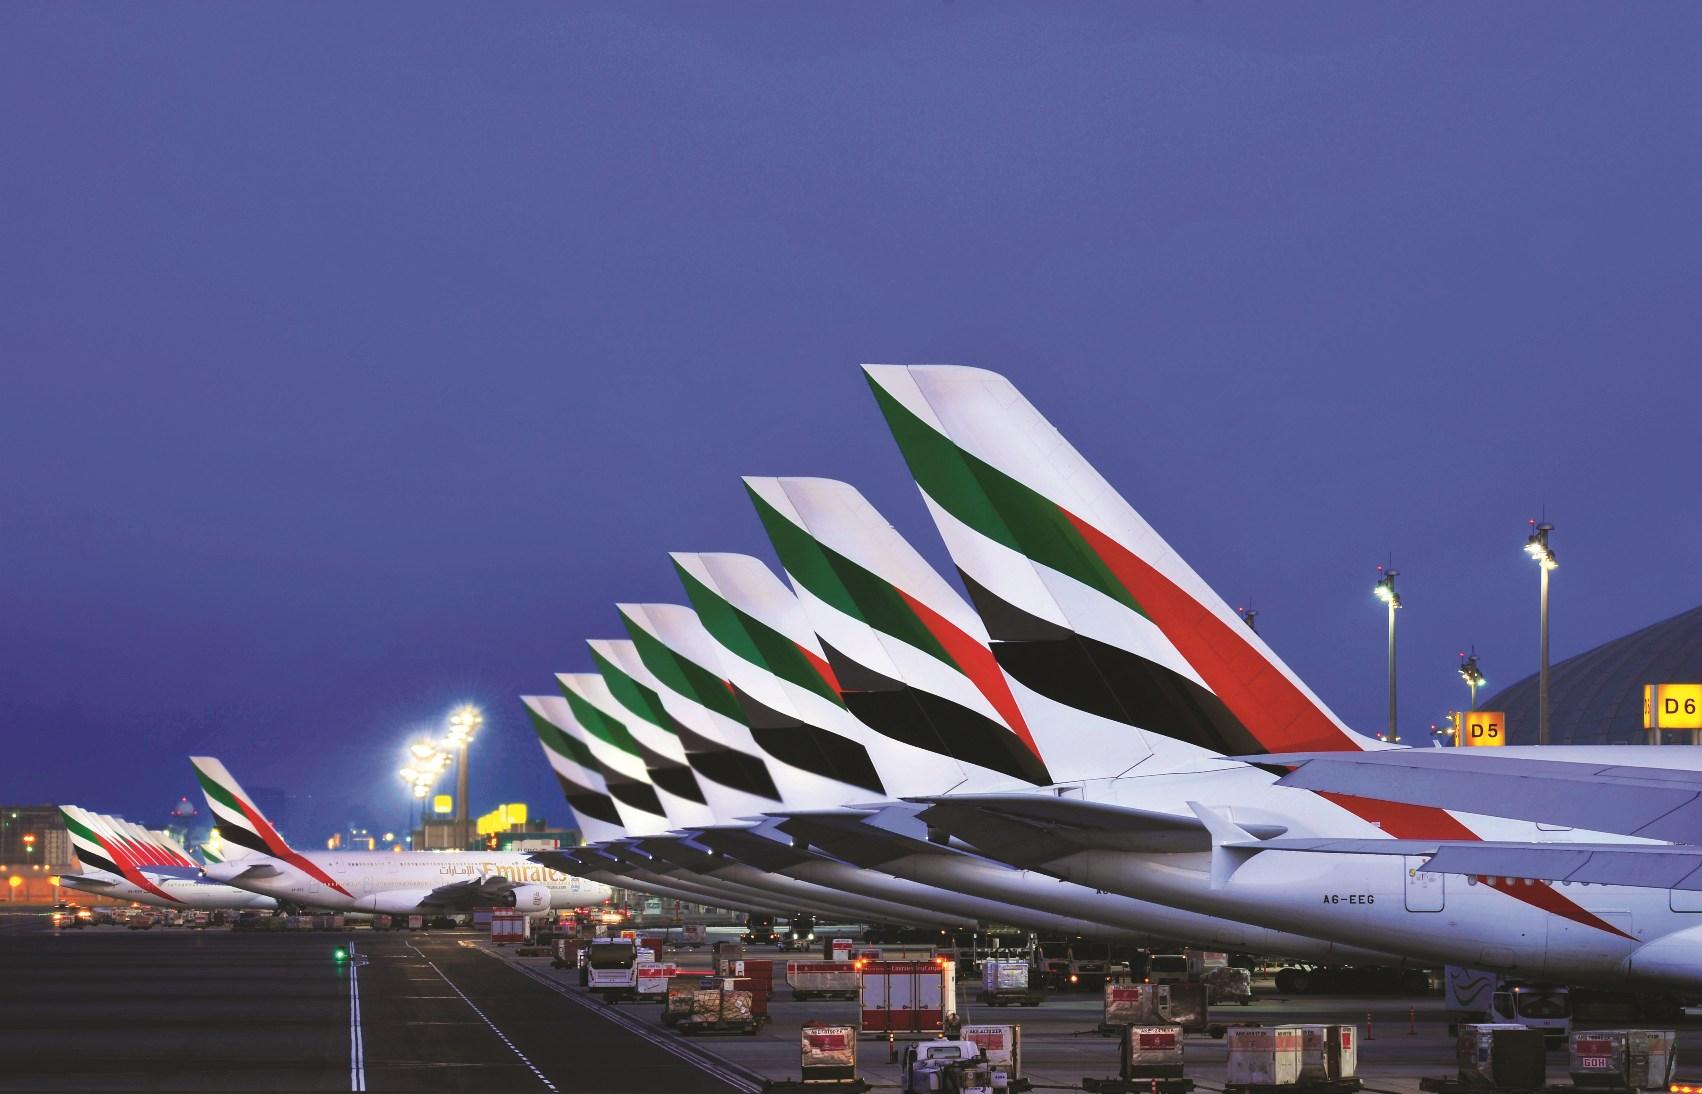 México quiere abrir vuelos con Dubái para atraer turistas del Golfo Pérsico